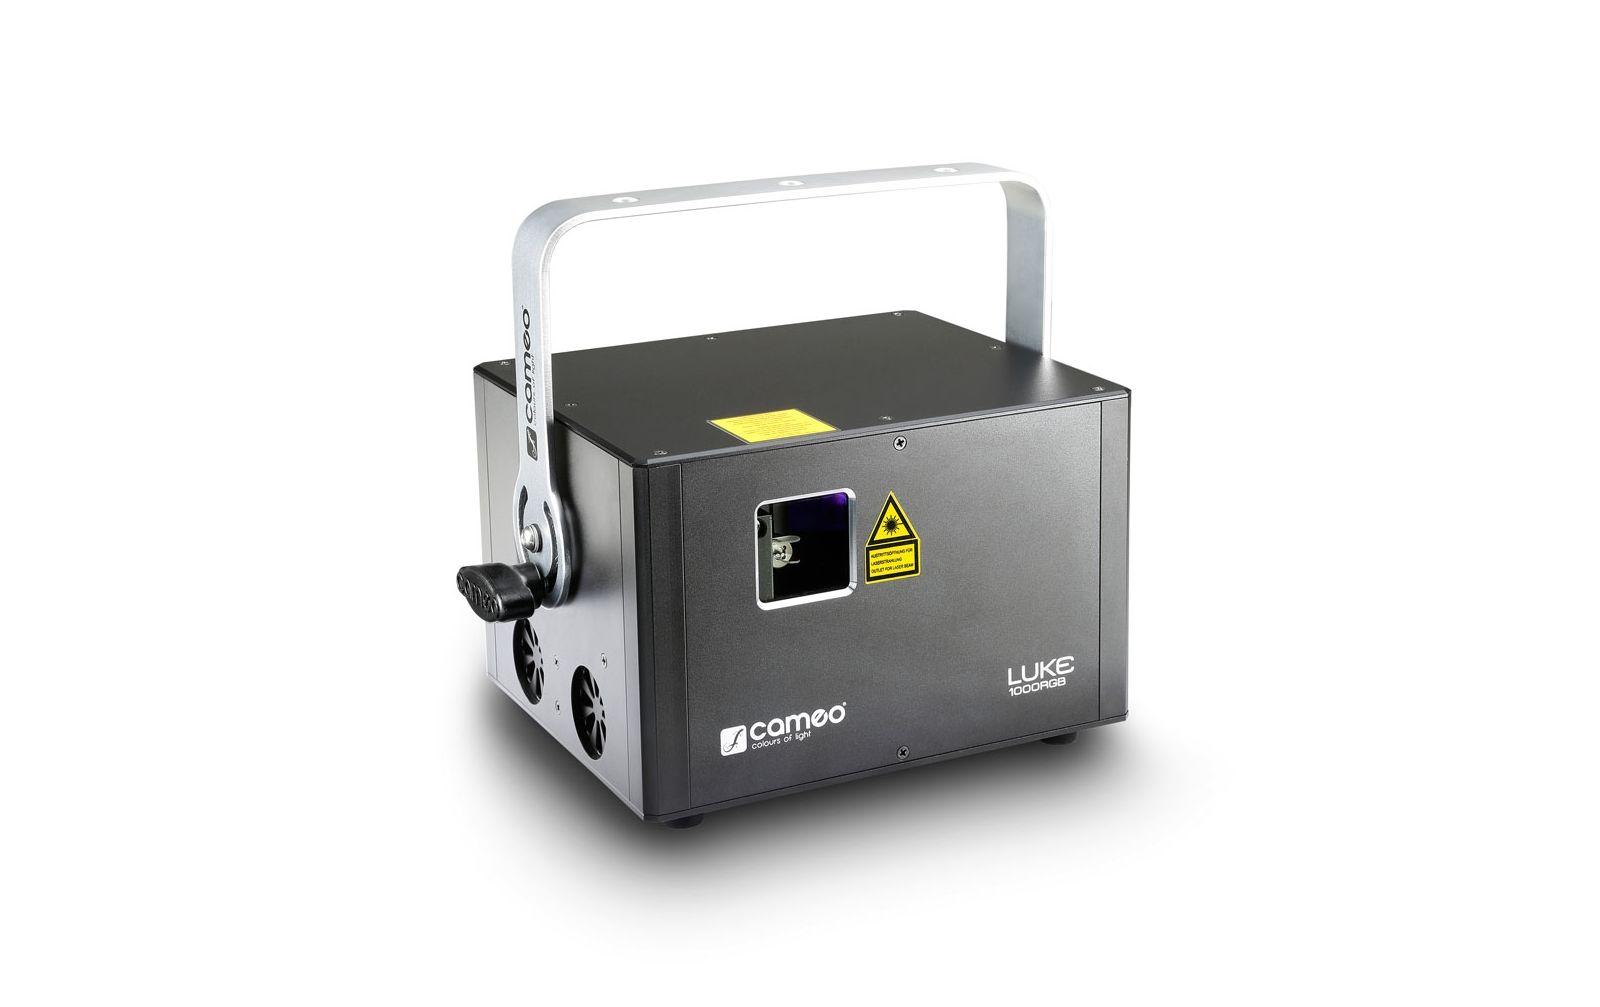 cameo-luke-1000-rgb-professioneller-1000mw-rgb-show-laser